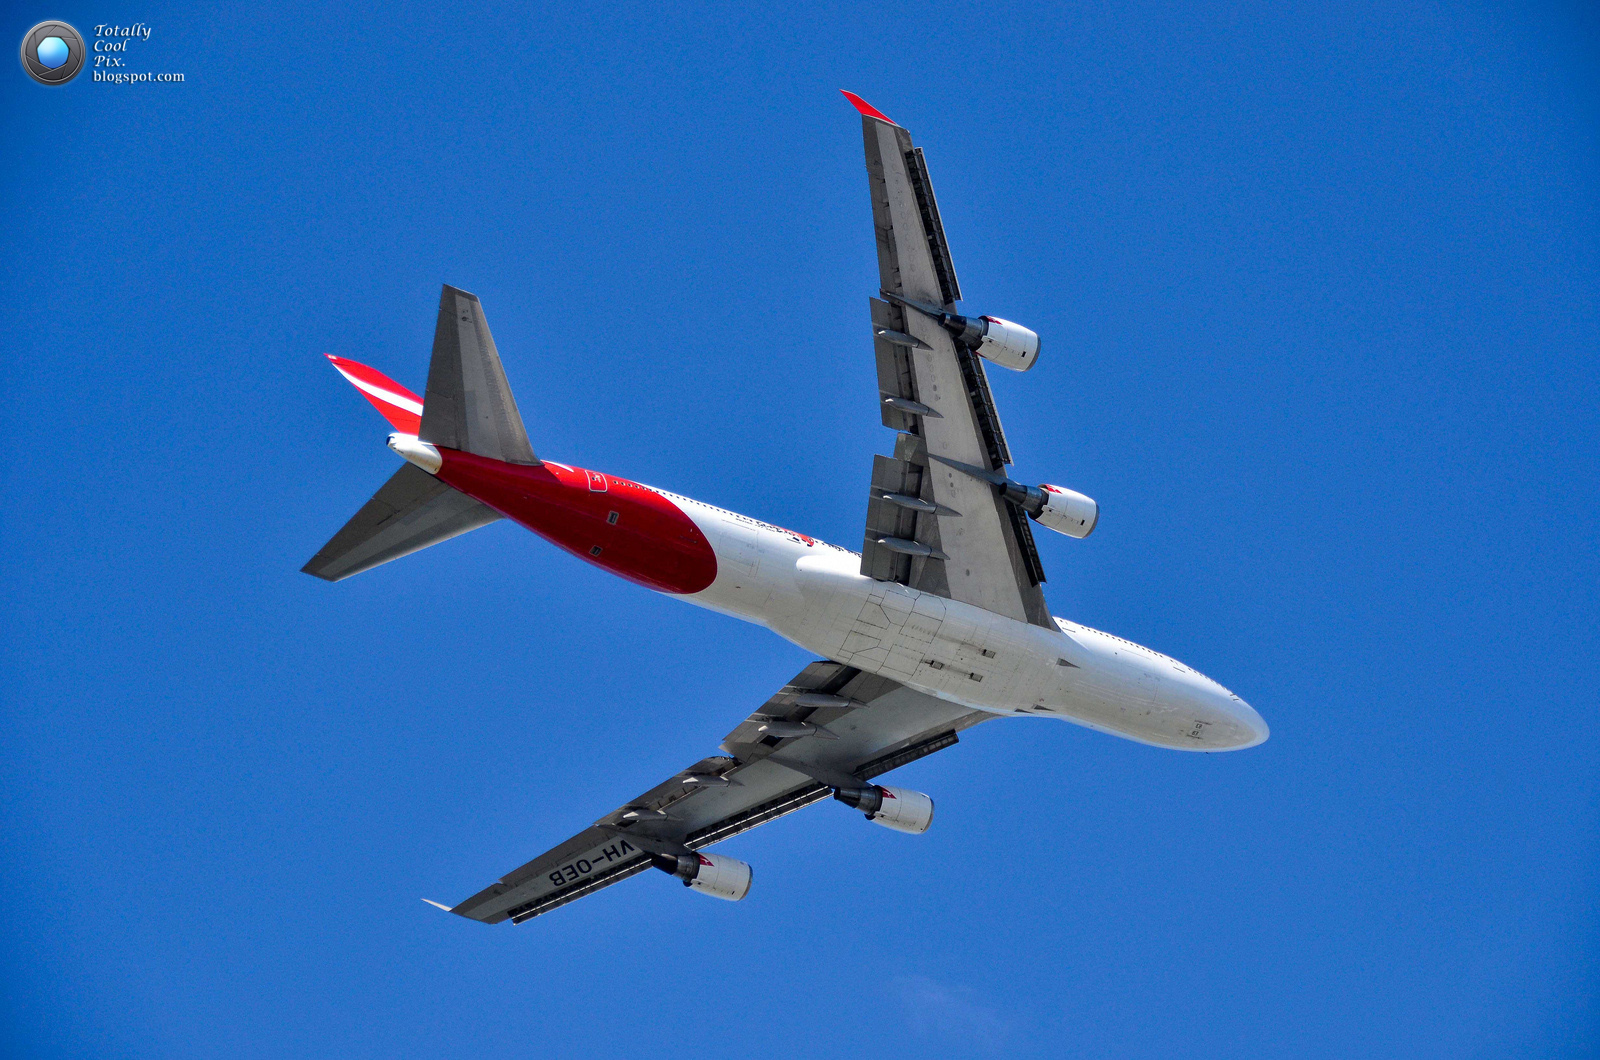 http://1.bp.blogspot.com/-VYqf8Q3CIEs/T9xWEJsJKYI/AAAAAAAABUw/aJ8JaFn1mmY/s1600/22-Australia-2012-F1-Grand-Prix-Airshow-Wallpaper-Keith-McInnes-Photography-QANTAS-747-overhead.jpg